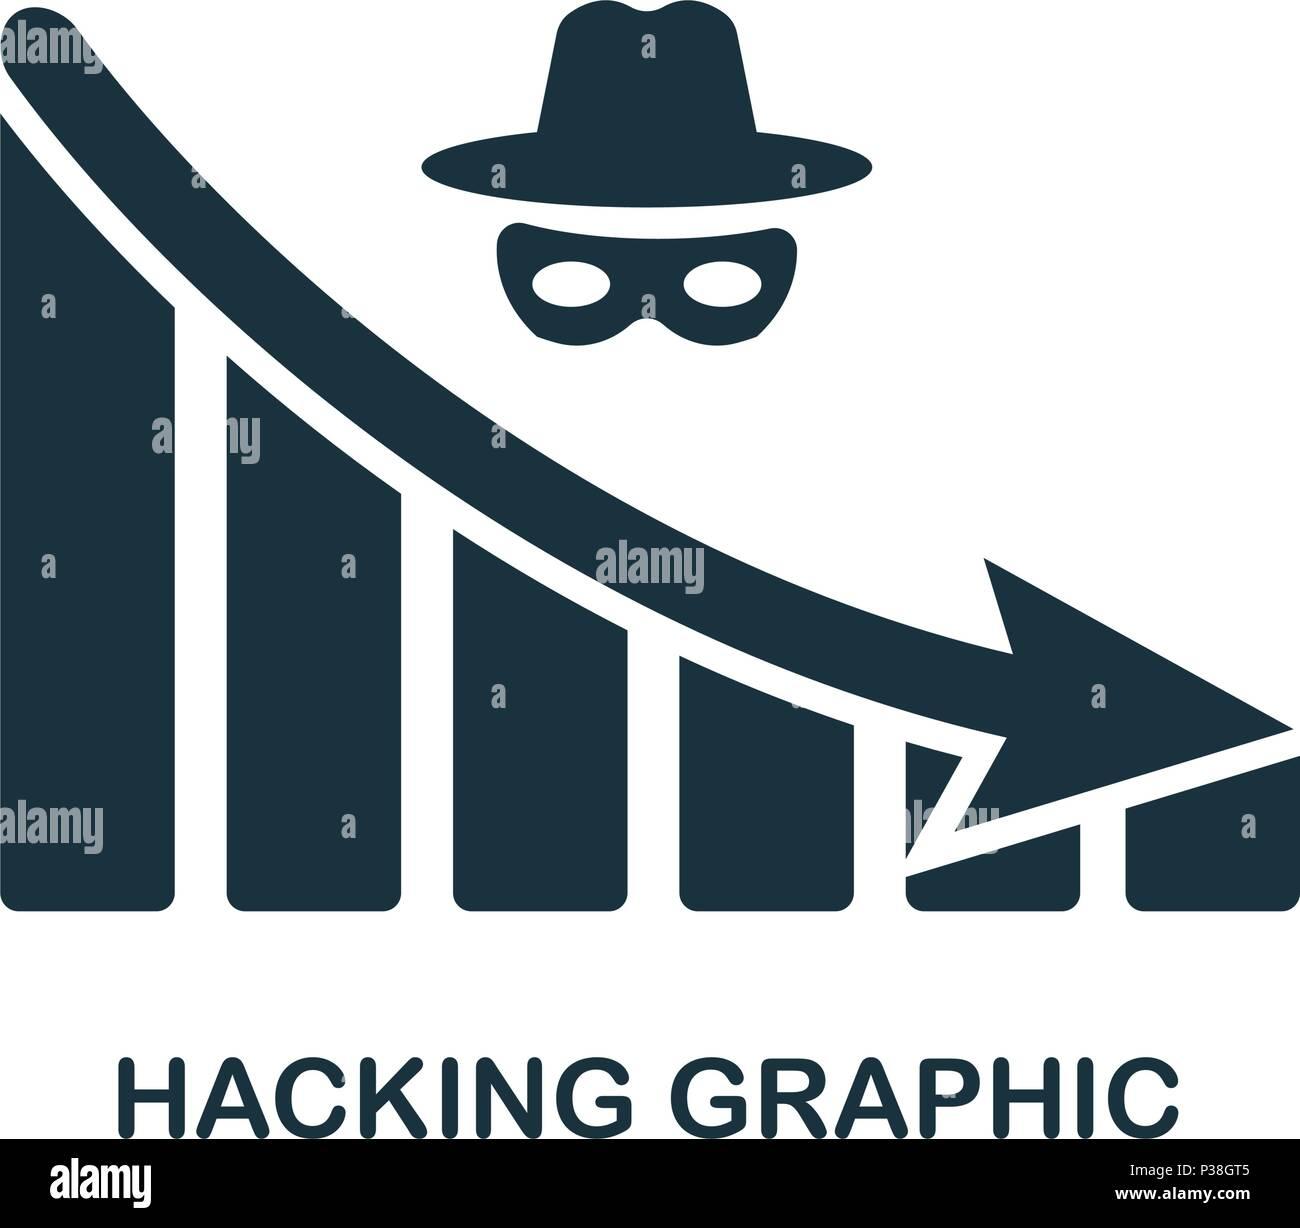 Hacking verringern das Symbol Grafik. Mobile App, Druck, Web site Symbol. Einfaches Element singen. Monochrome Hacking verringern das Symbol Grafik Illustration. Stockbild